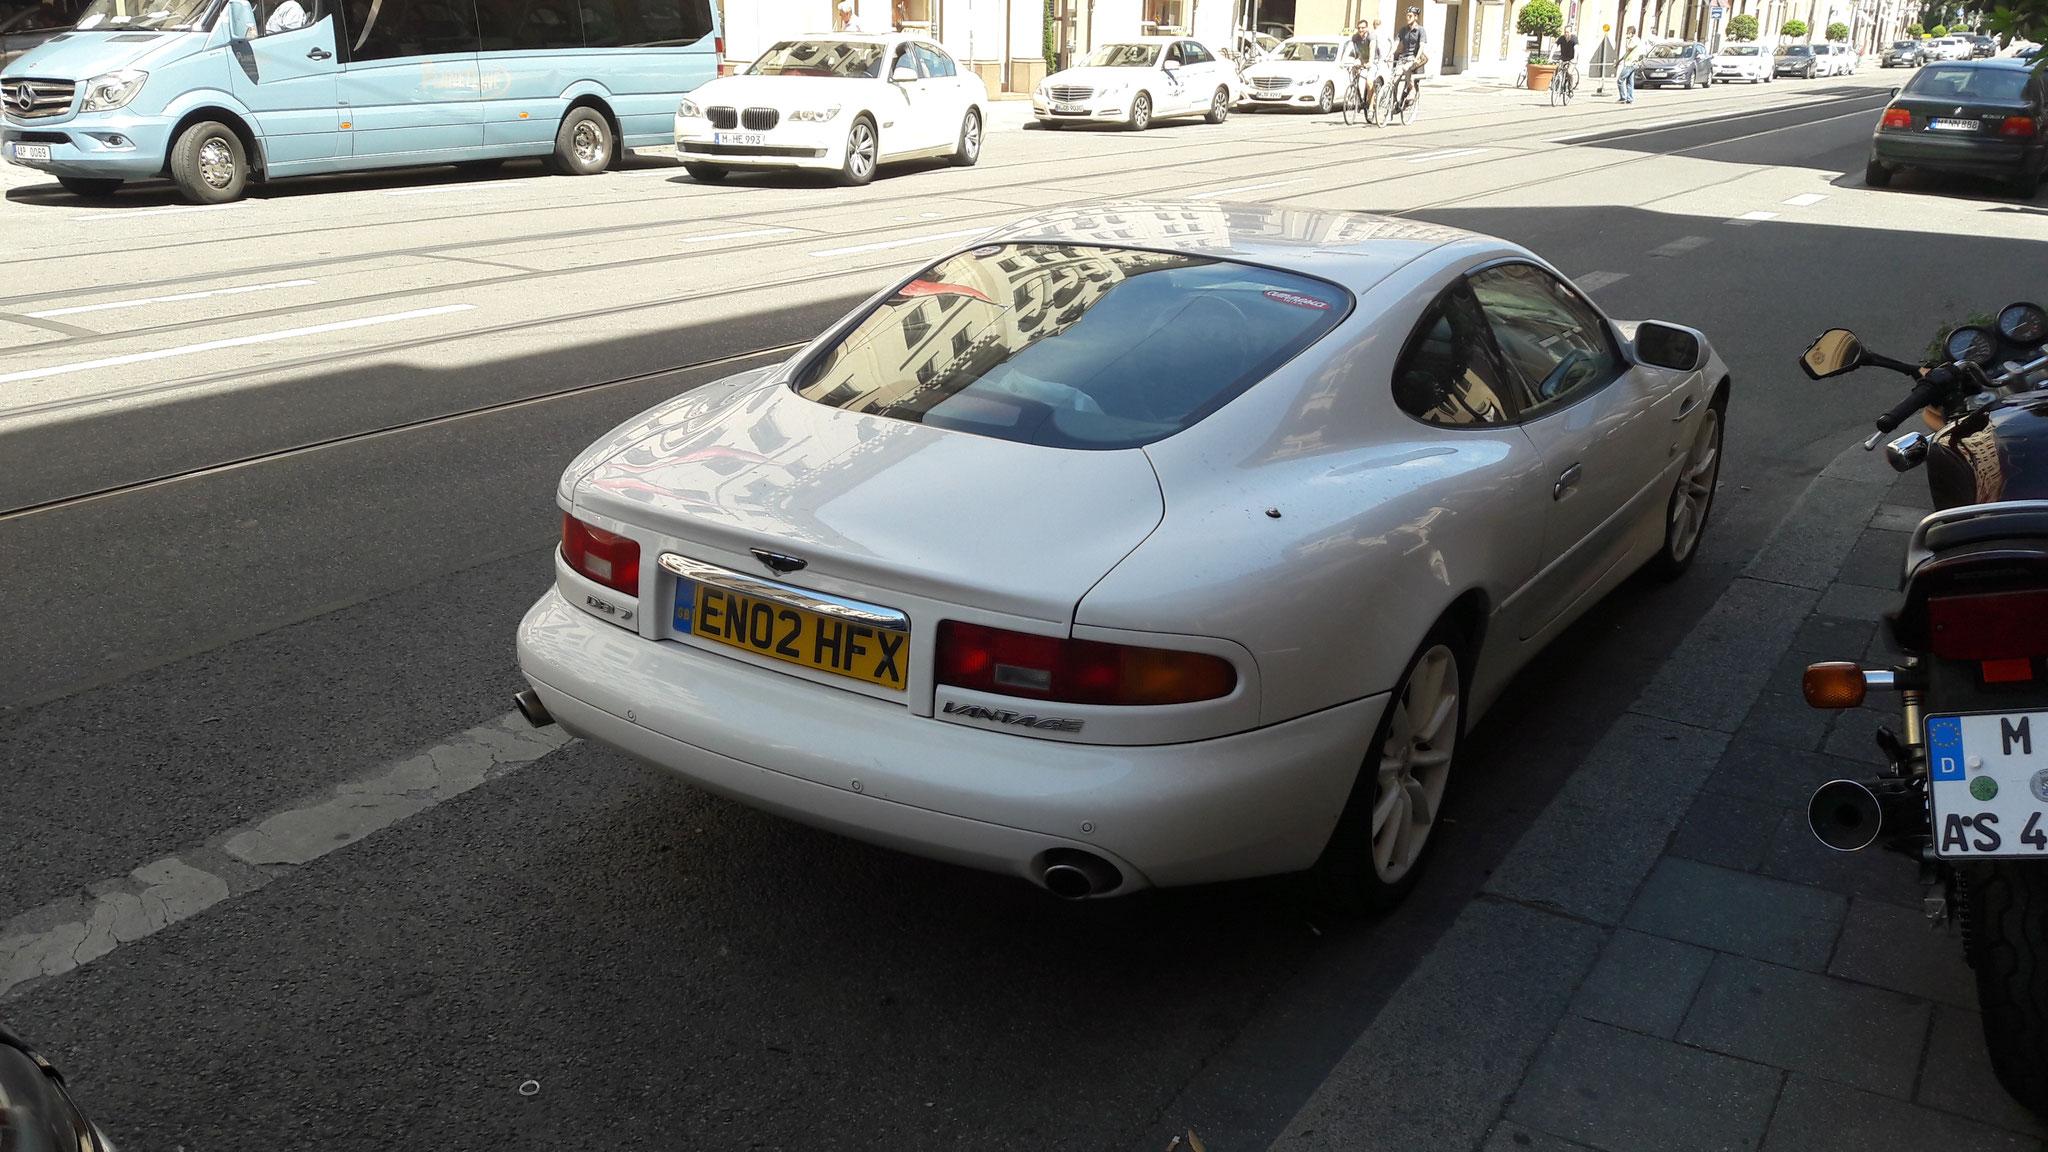 Aston Martin DB7 - EN02-HFX (GB)